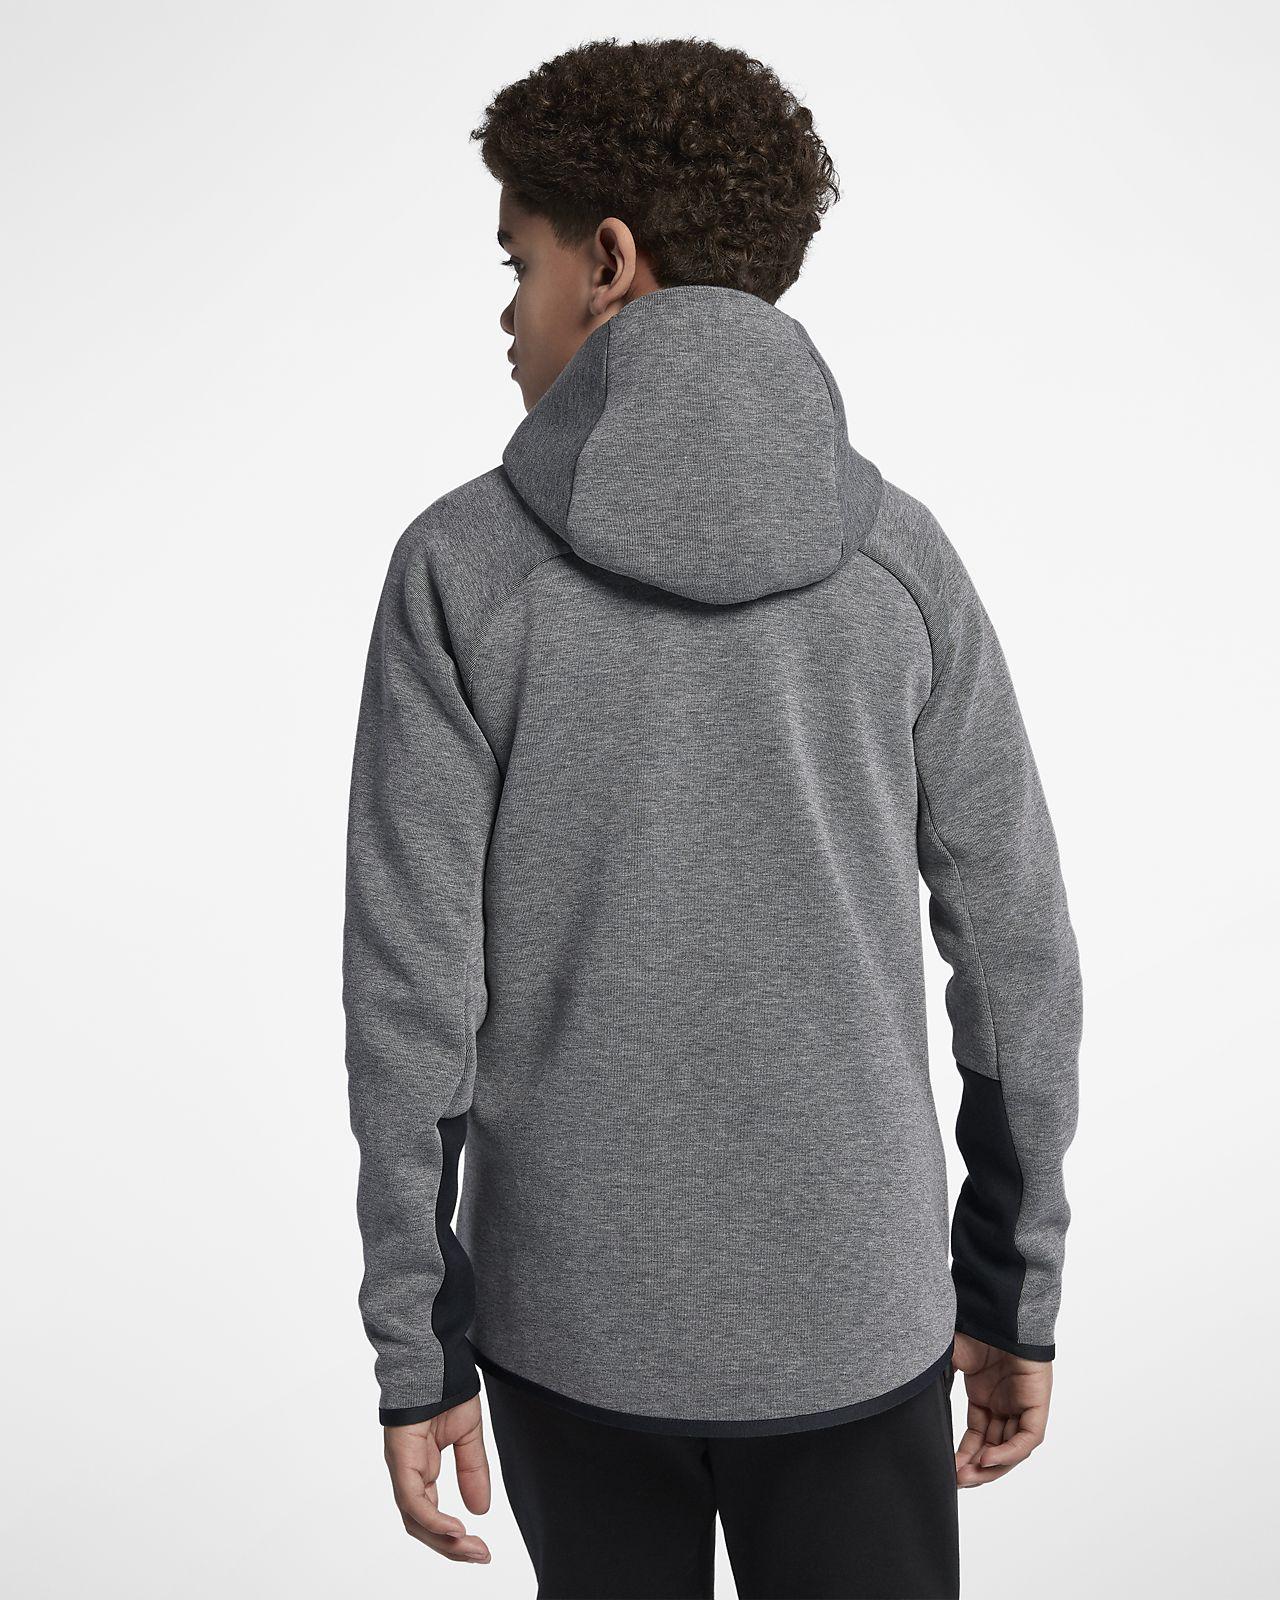 sweat capuche enti rement zipp nike sportswear tech fleece windrunner pour gar on plus g. Black Bedroom Furniture Sets. Home Design Ideas